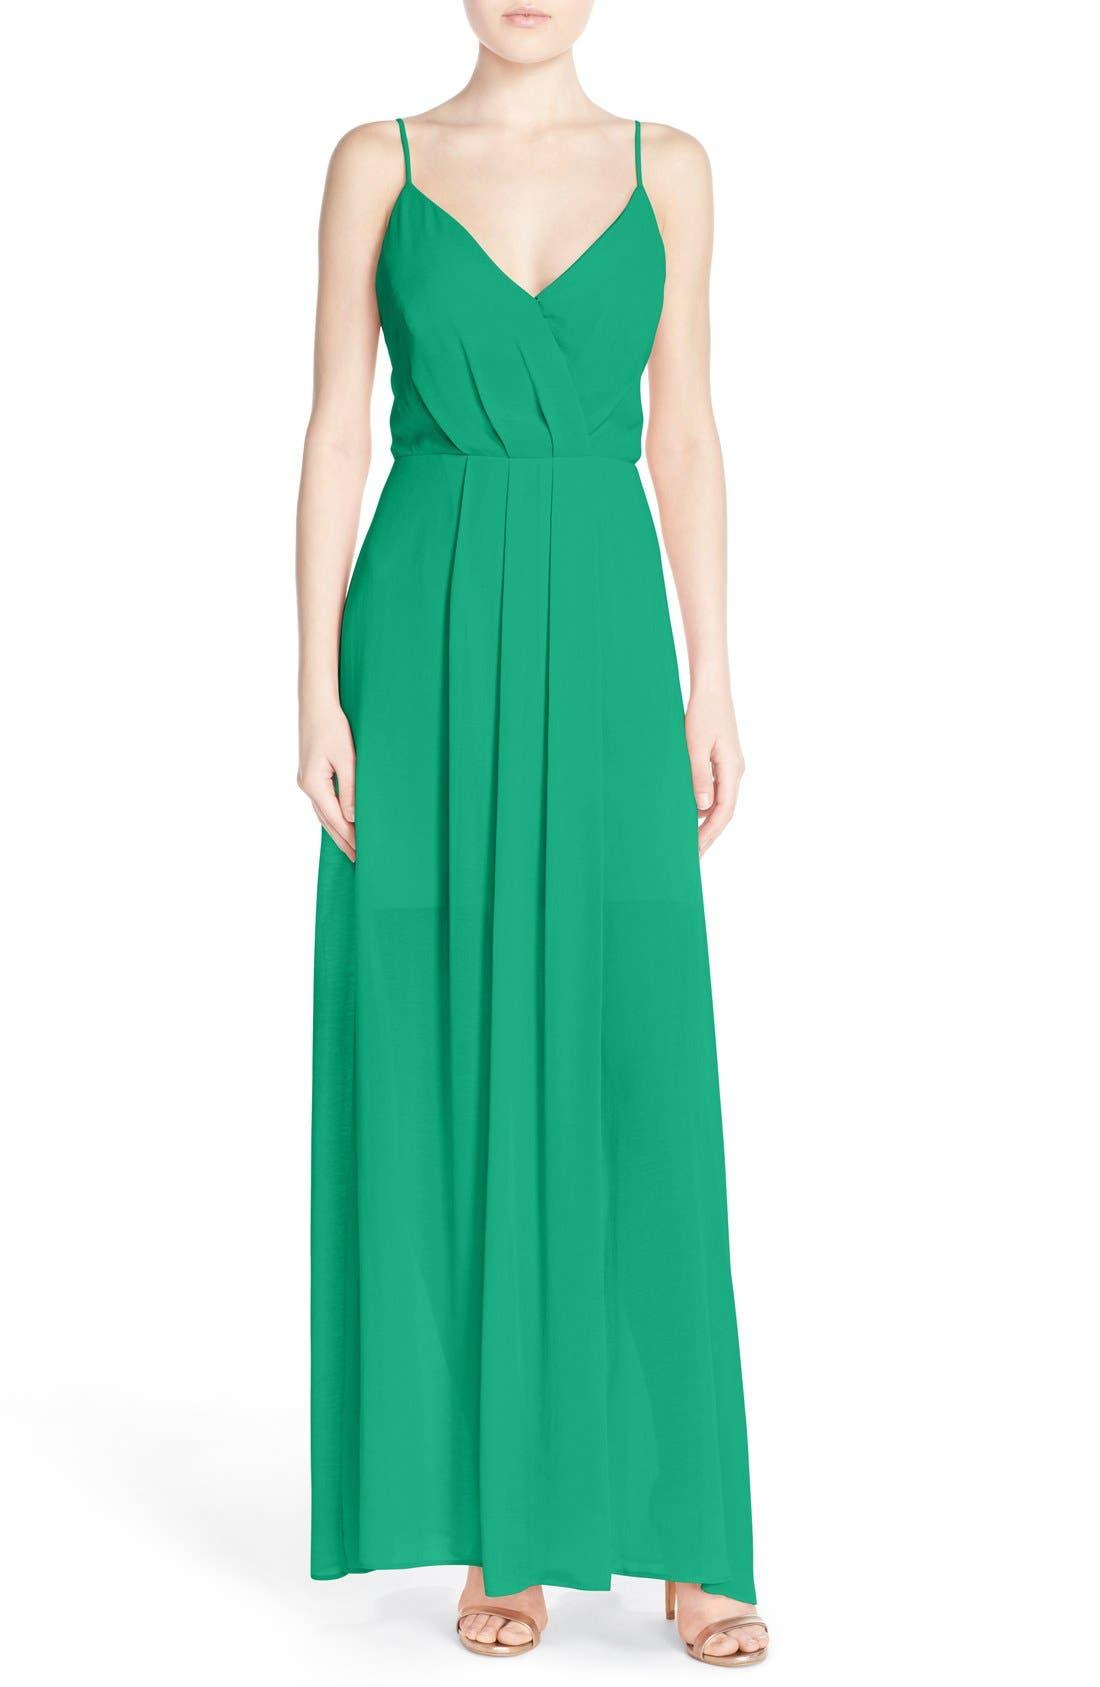 ADELYN RAE Cutout Back Chiffon Maxi Dress, Main, color, 340